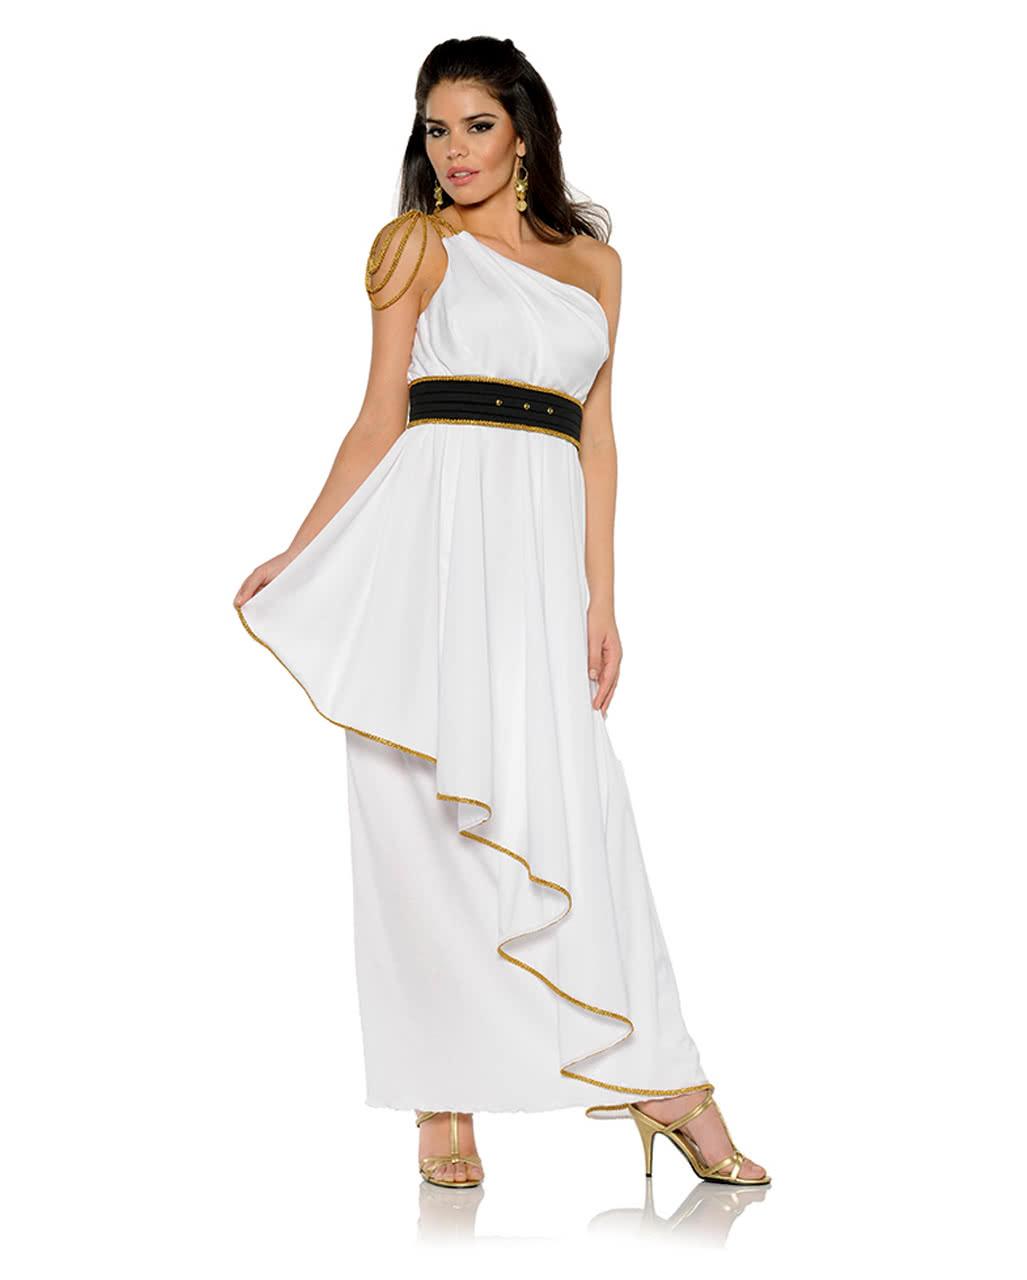 Athena costume romans greeks buy costumes horror shop solutioingenieria Image collections